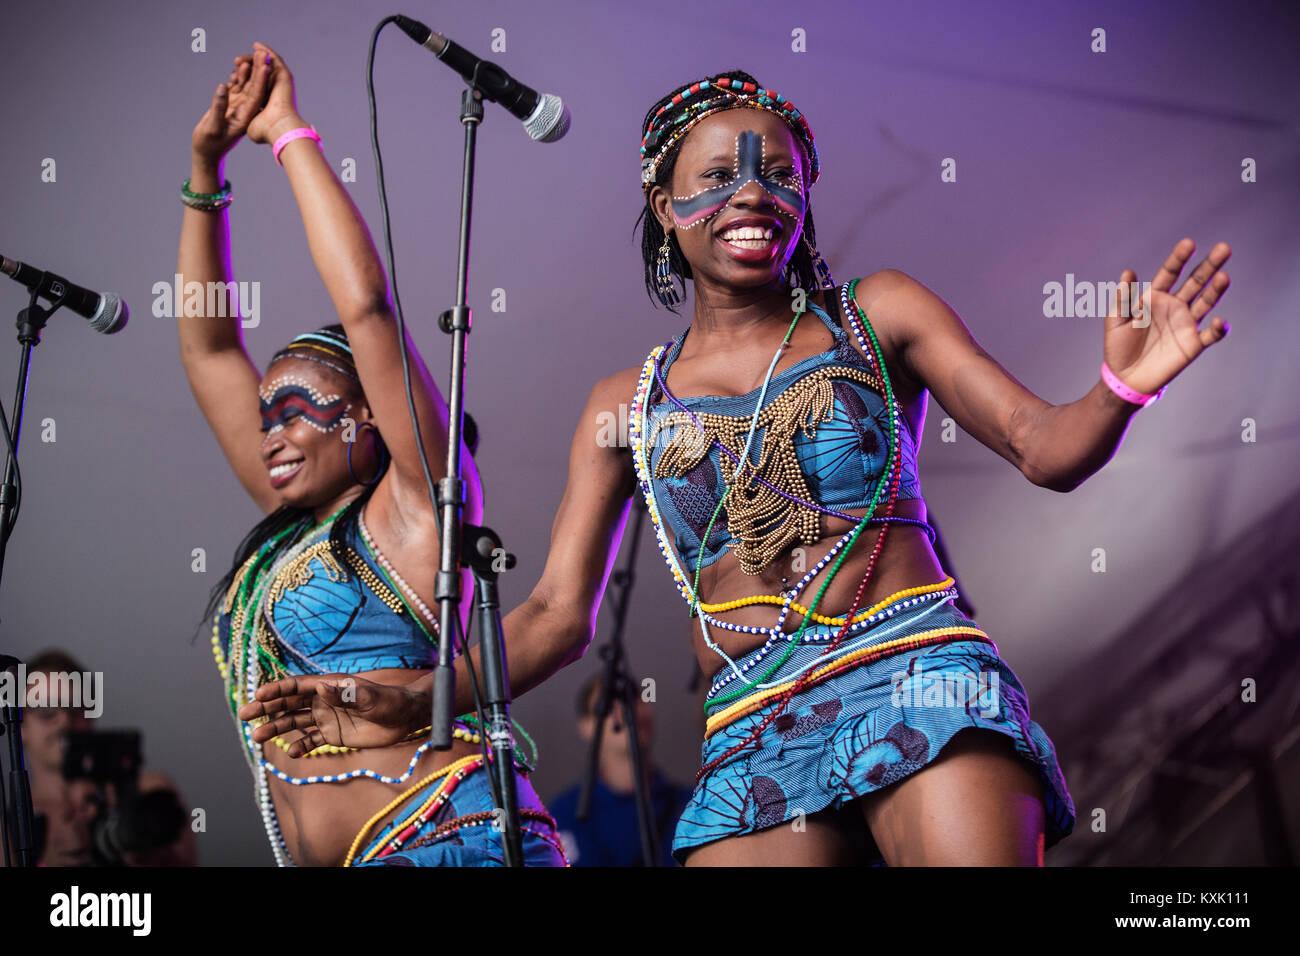 Fela Kuti Stock Photos & Fela Kuti Stock Images - Alamy